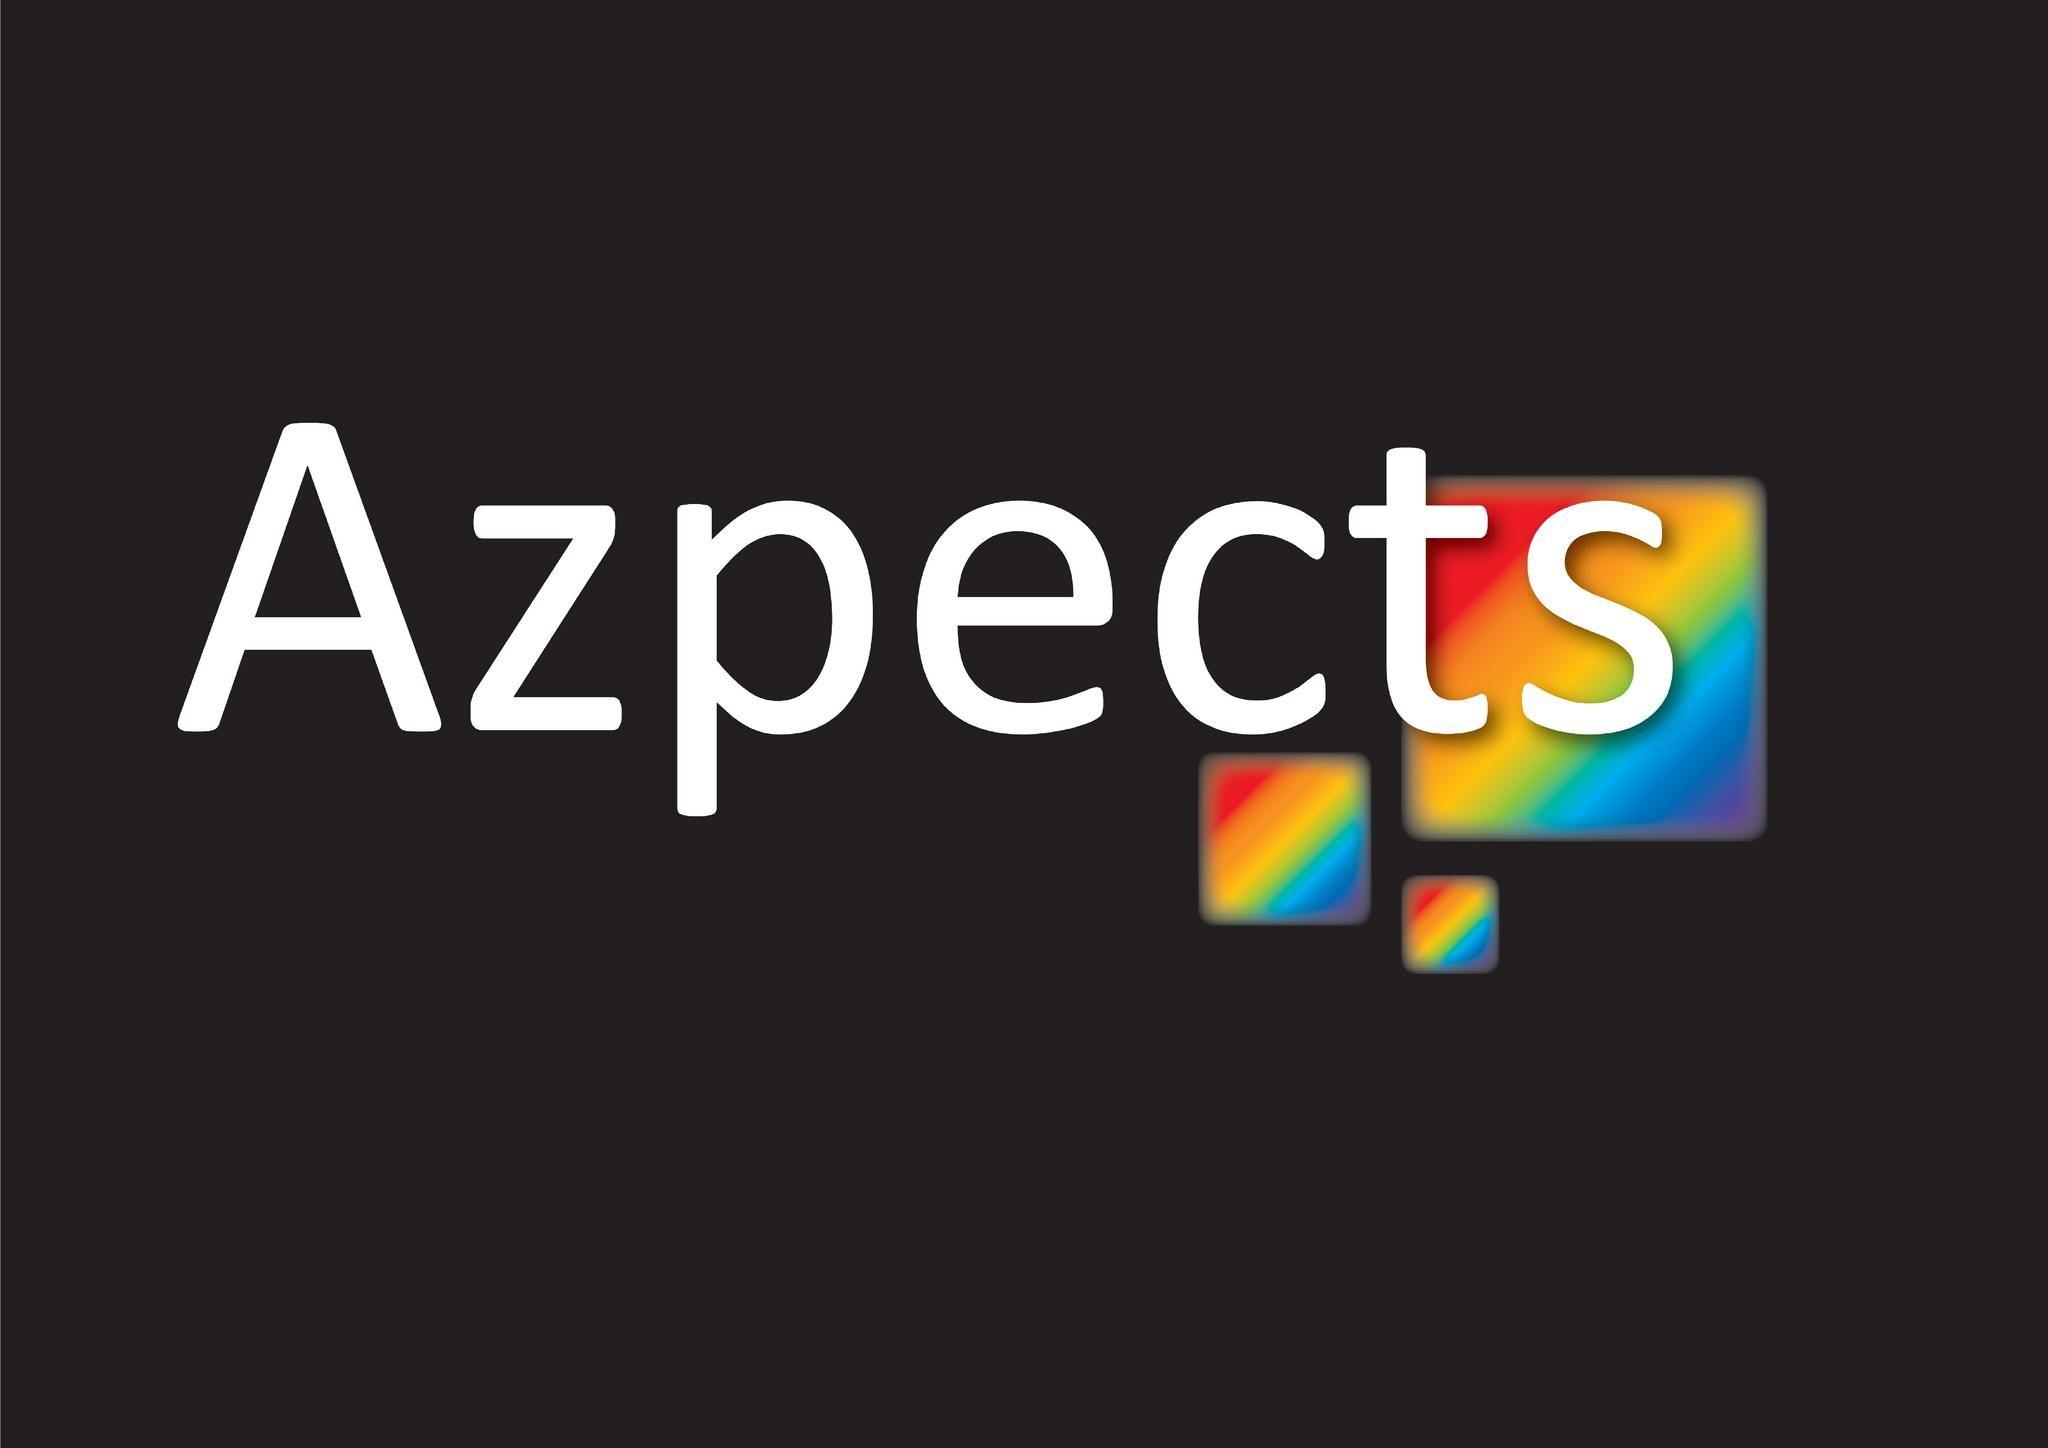 Azpects